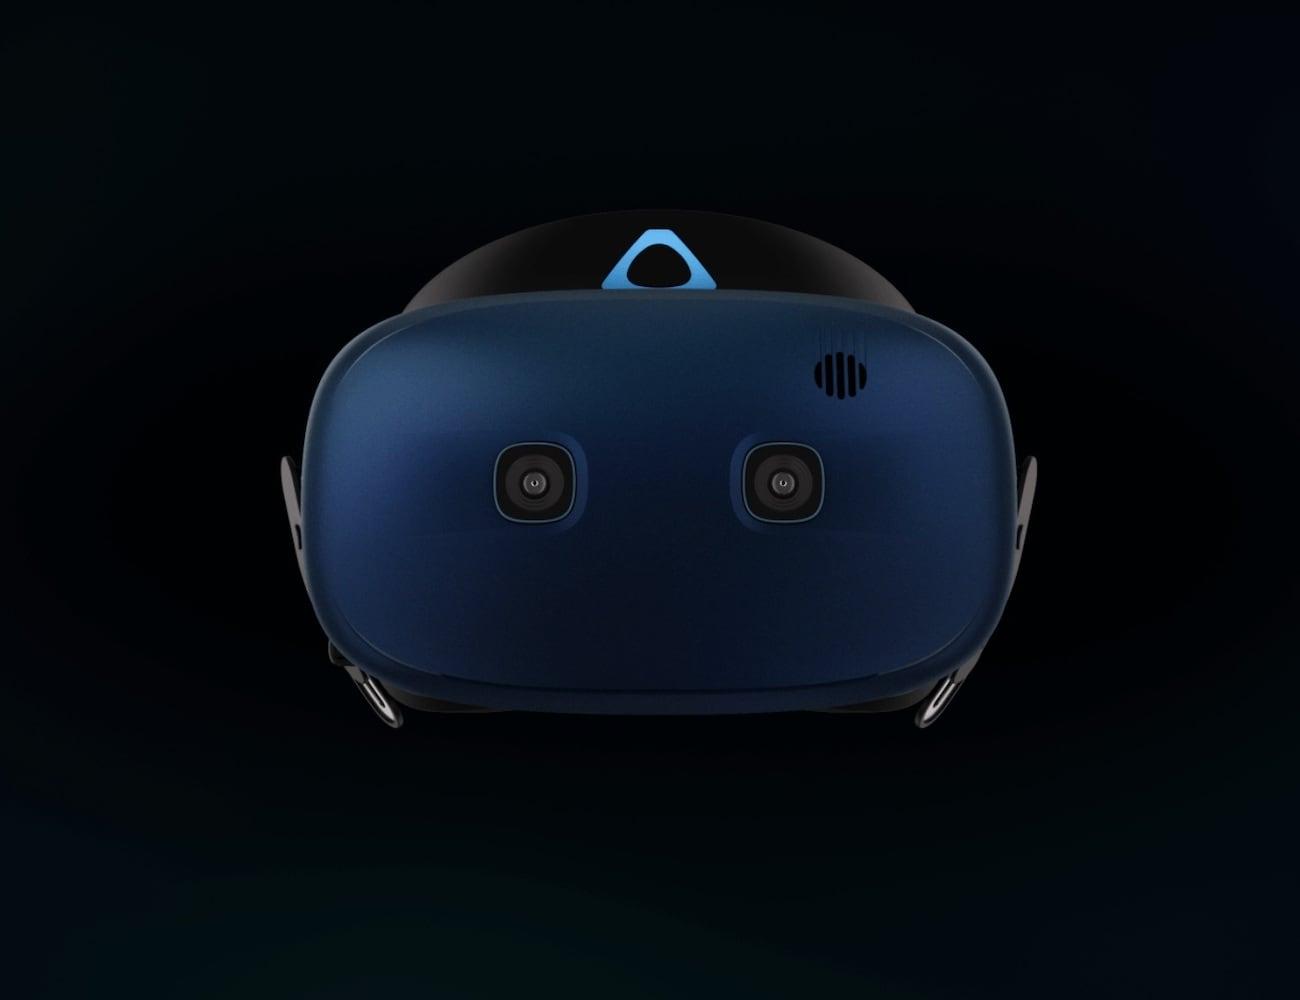 HTC VIVE Cosmos Premium PC VR System » Gadget Flow